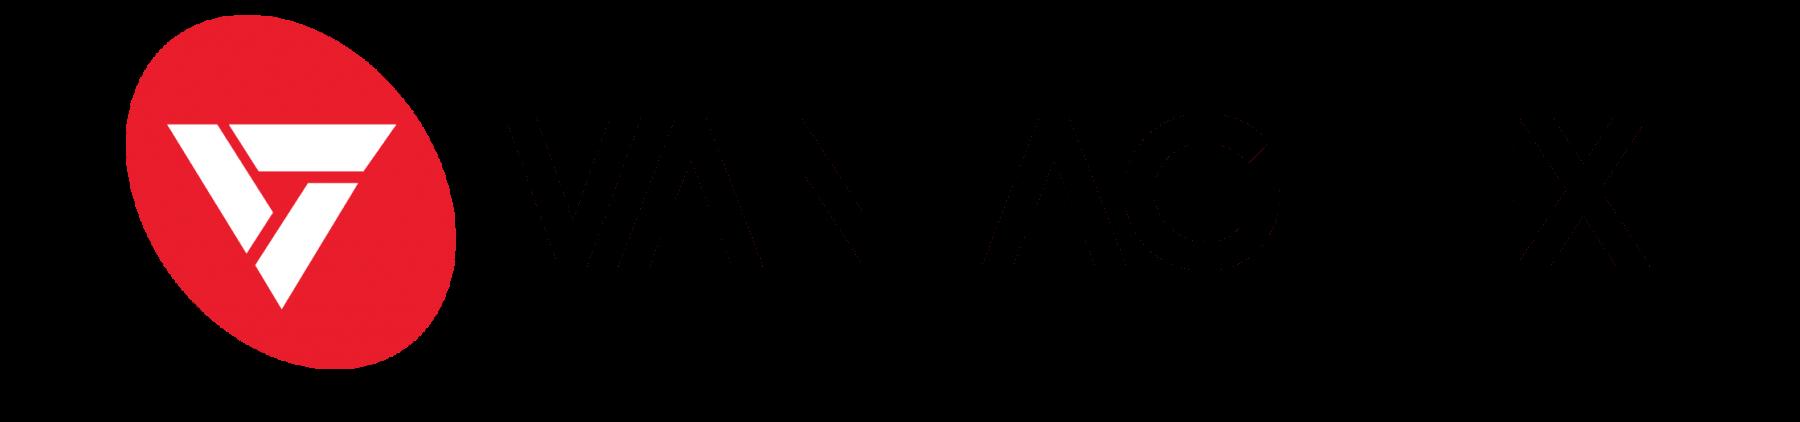 Vantage-FX-1